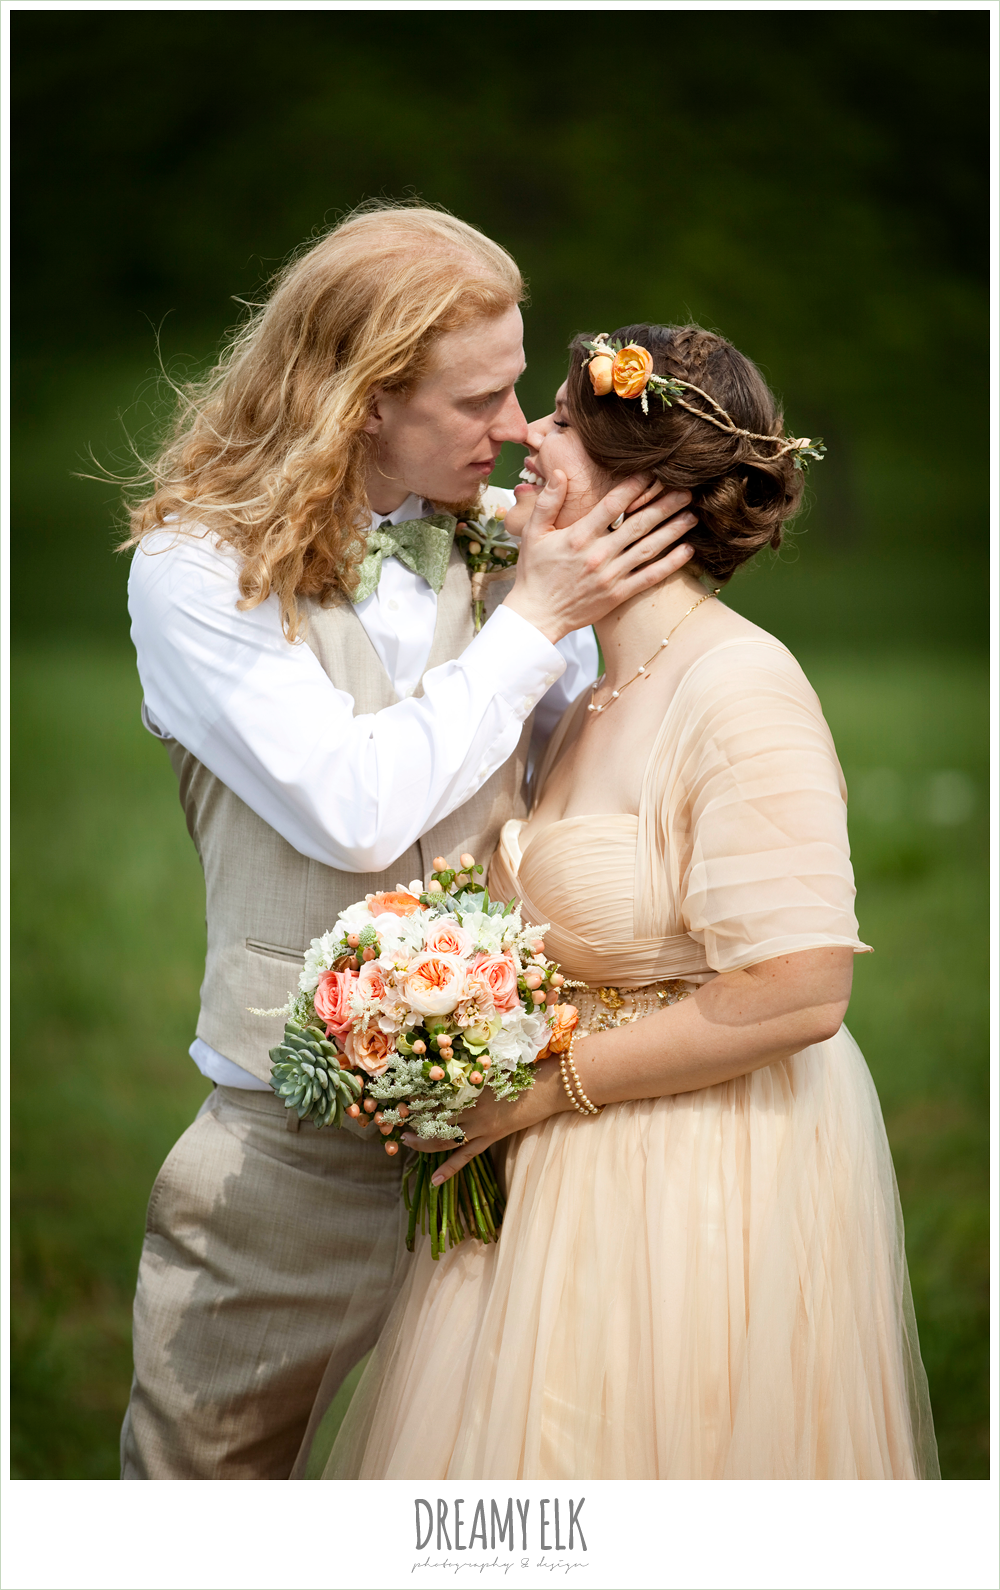 ashley & brandon, the wedding photo contest